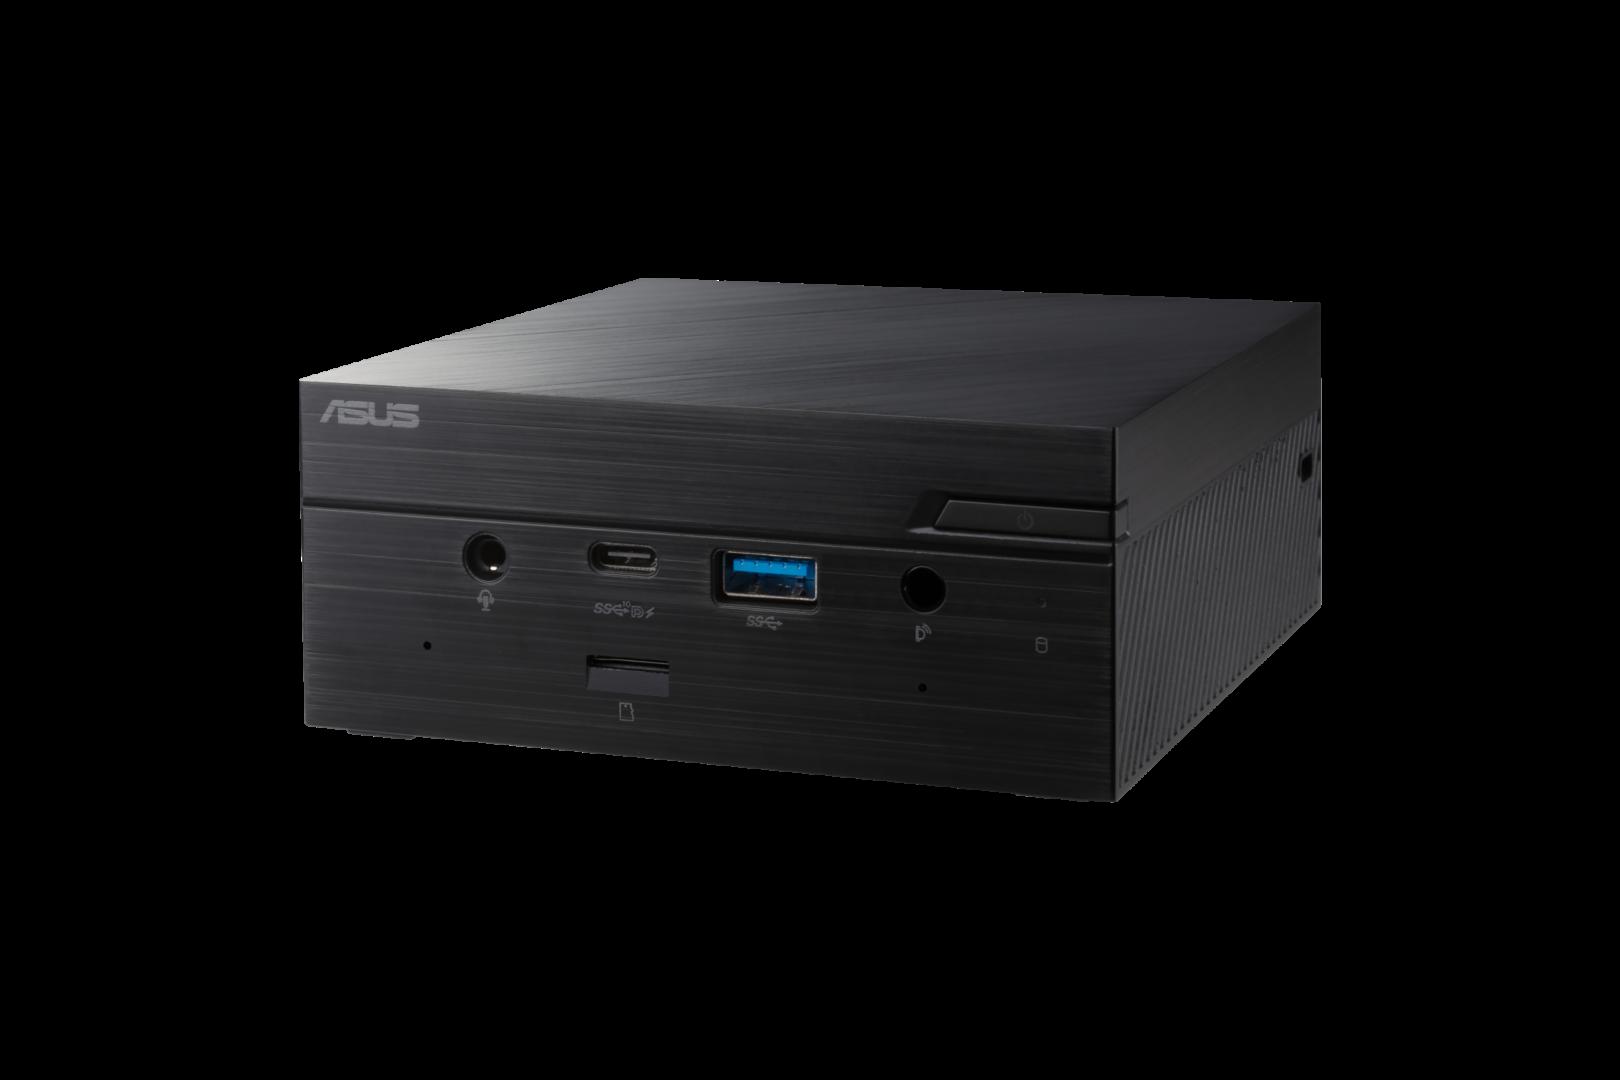 ASUS Mini PC PN51